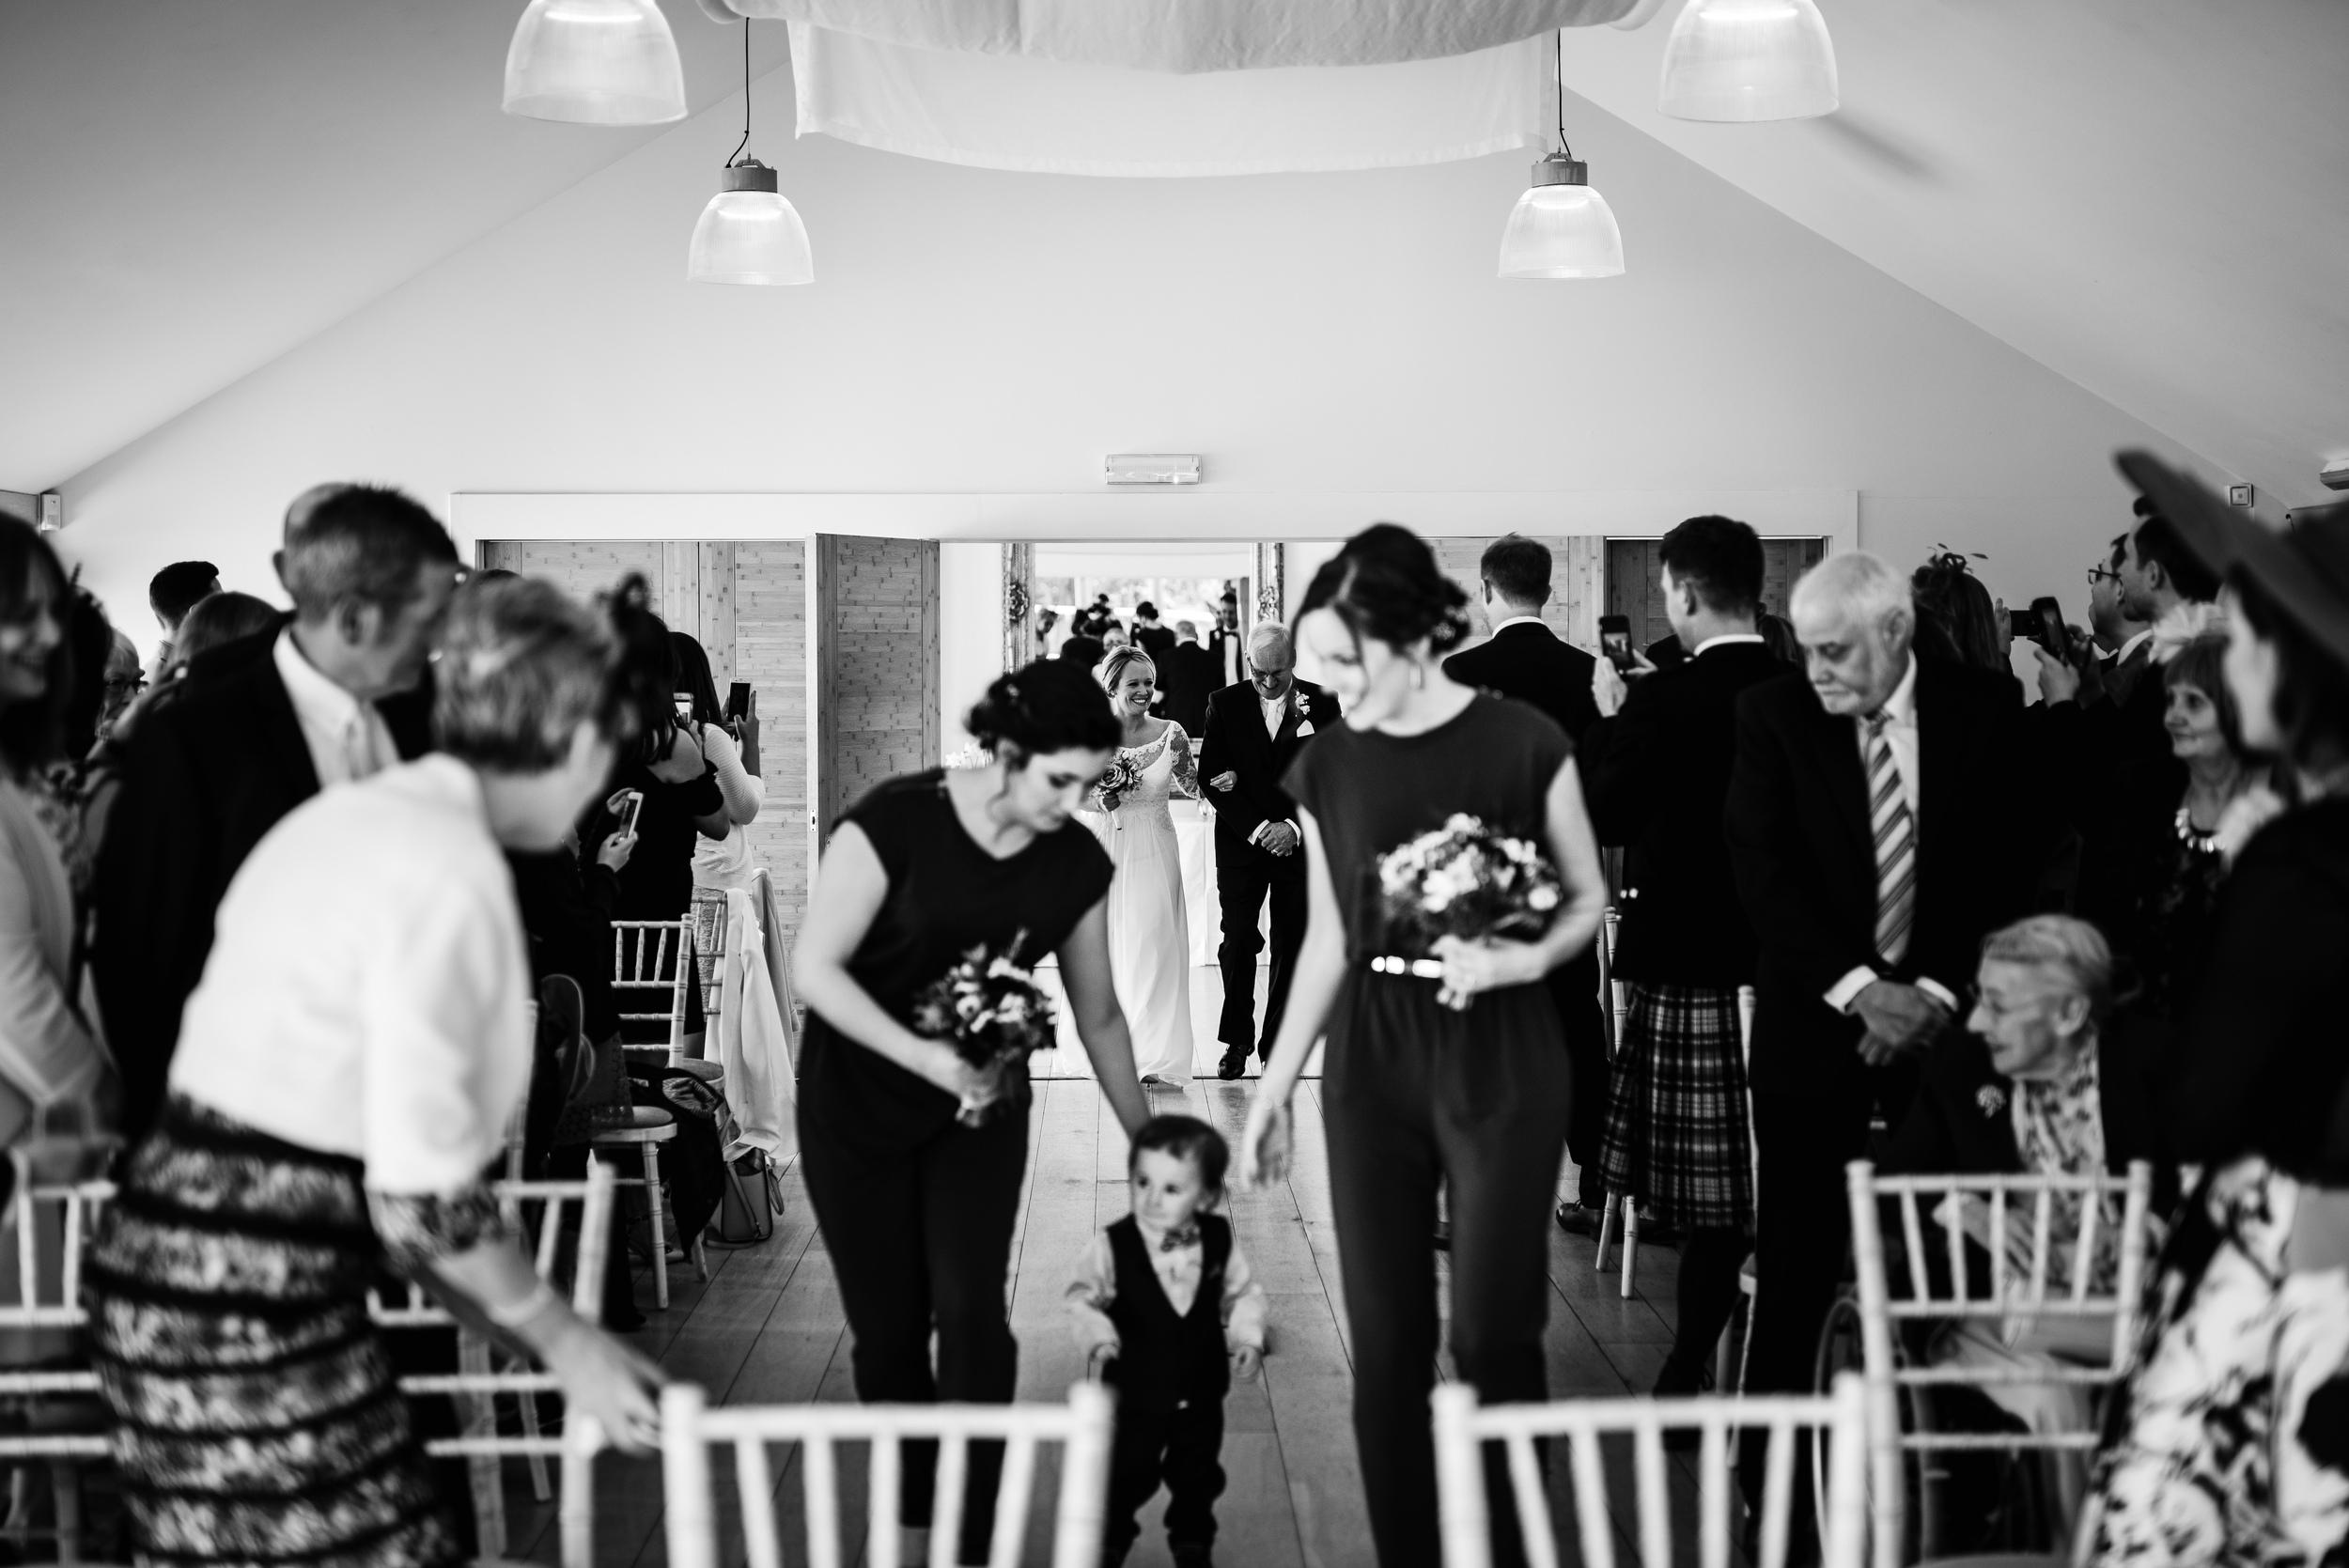 Wasing Park Wedding Photography - Emma & Sarah-119.jpg